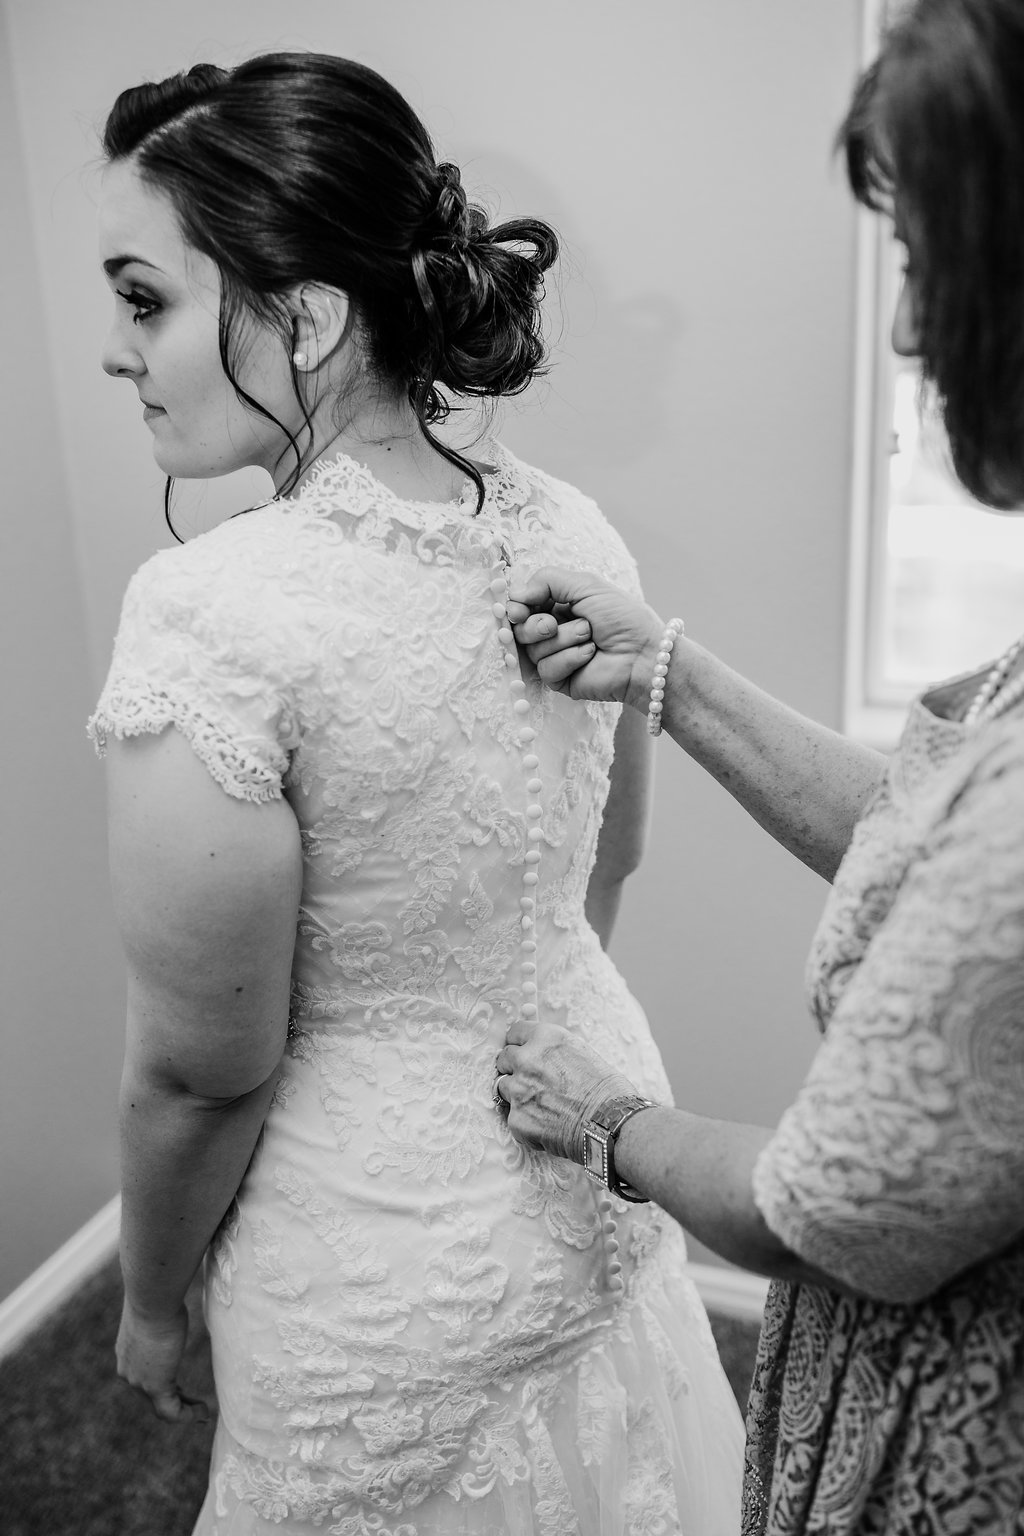 bride wedding day prep button down wedding dress black and white wedding photography utah